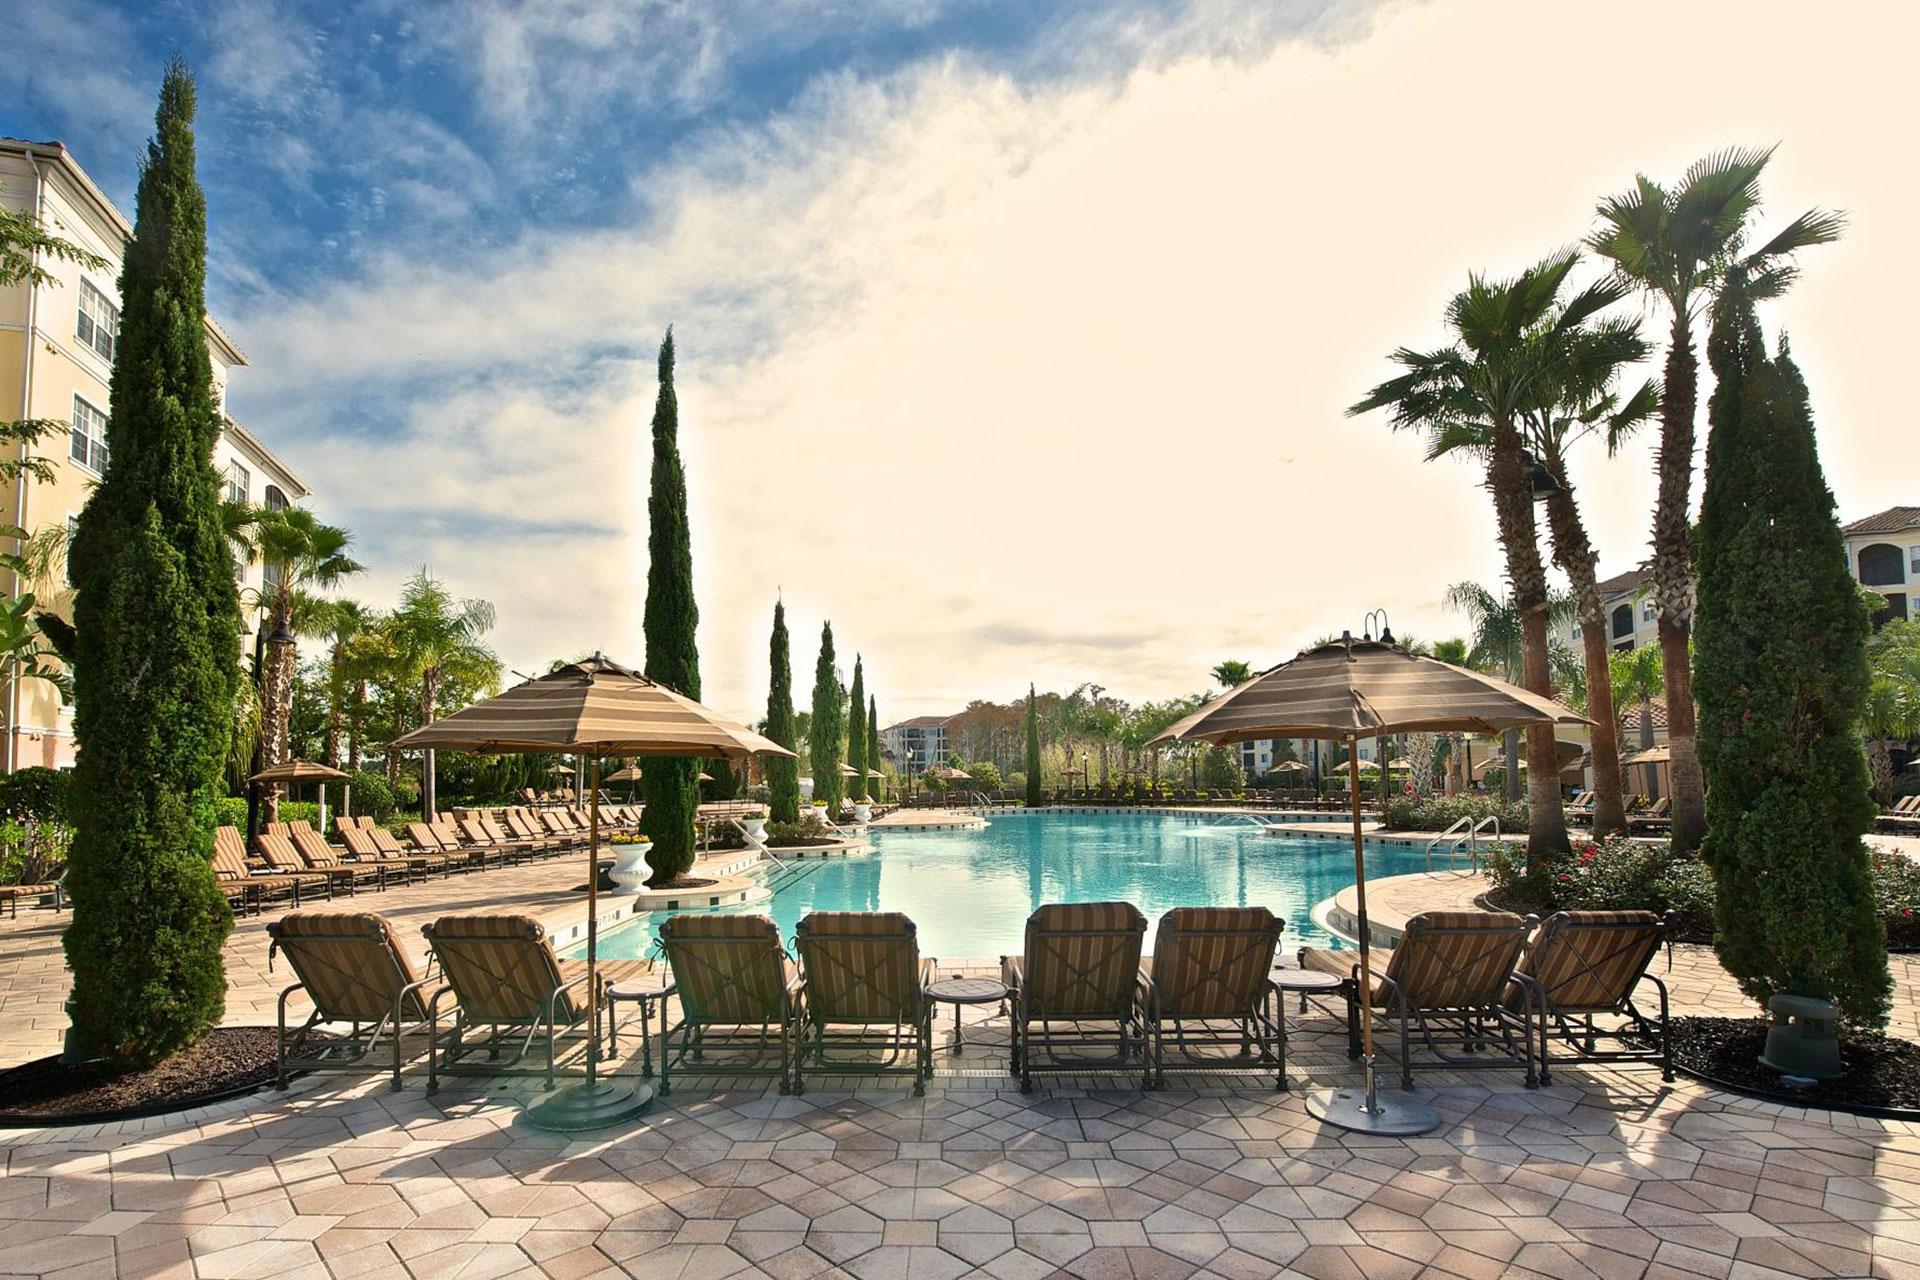 Pool at WorldQuest Orlando Resort